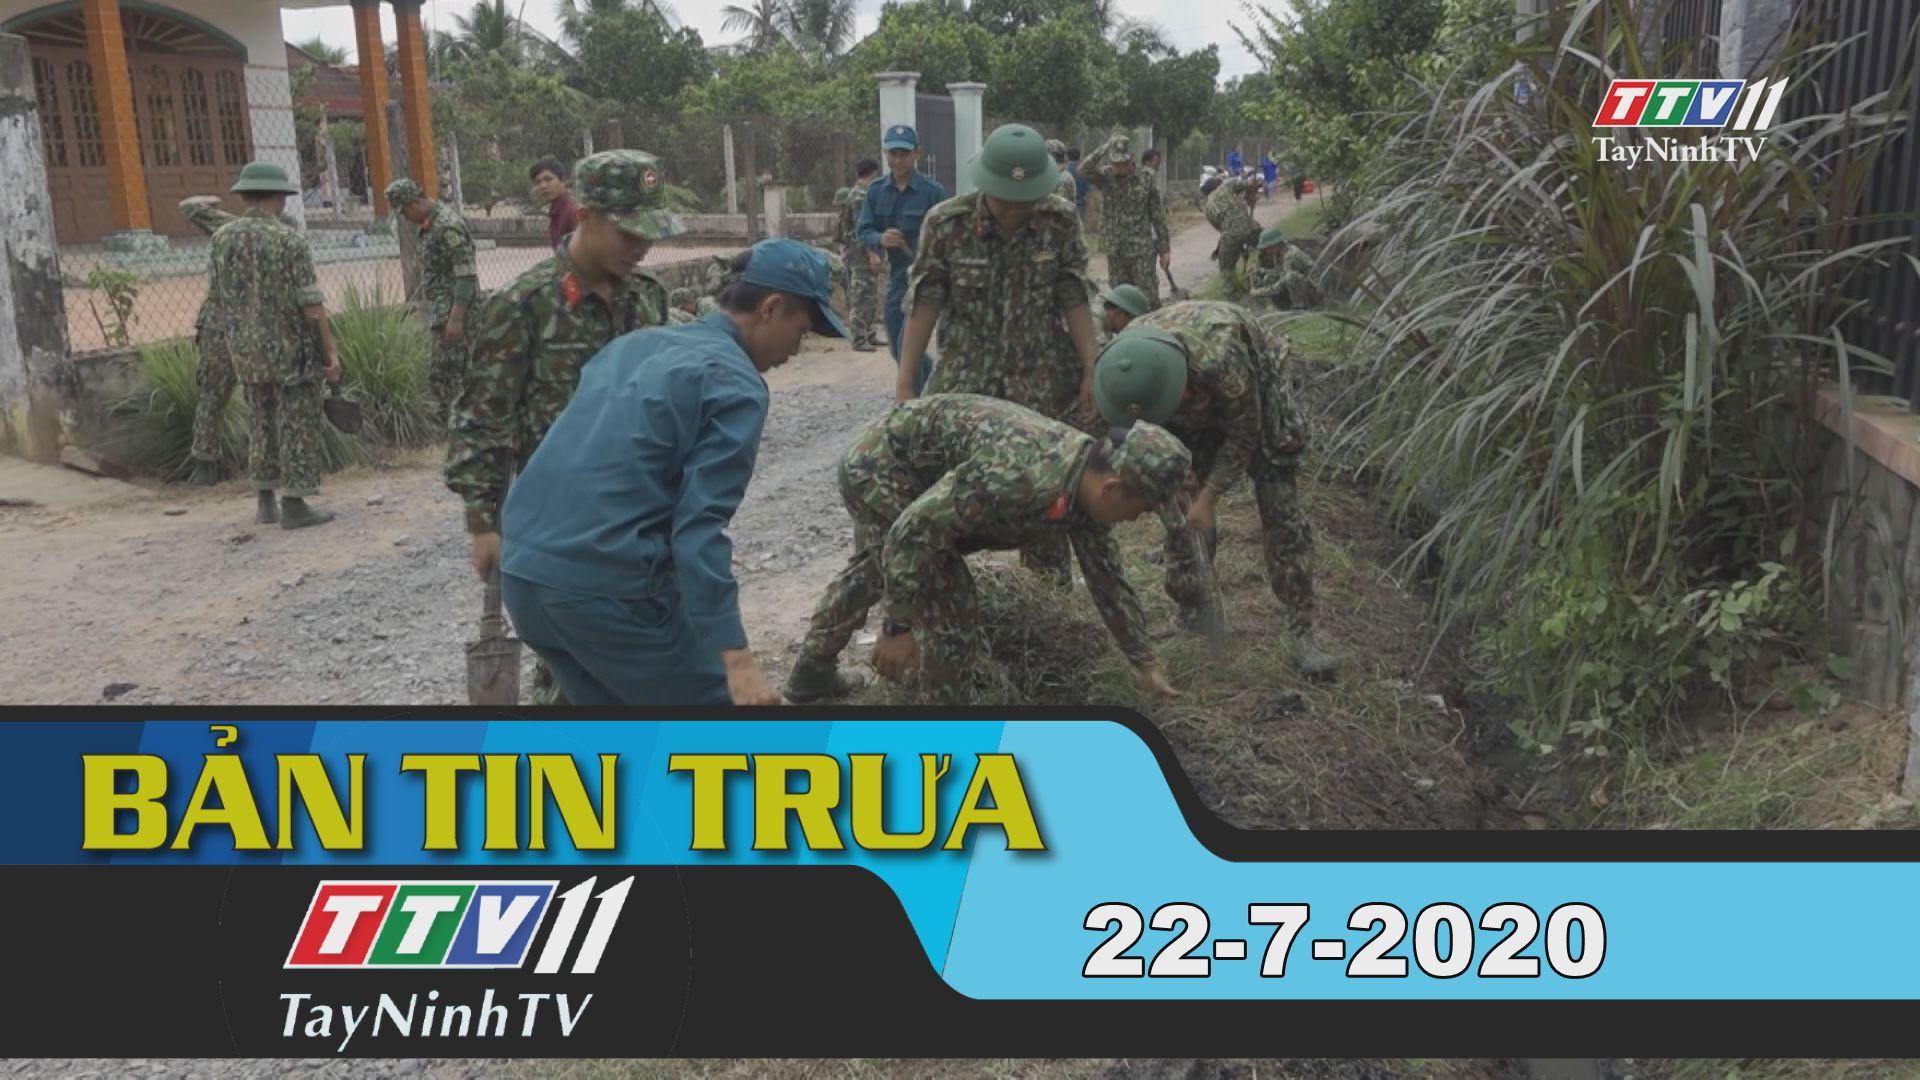 Bản tin trưa 22-7-2020 | Tin tức hôm nay | TayNinhTV